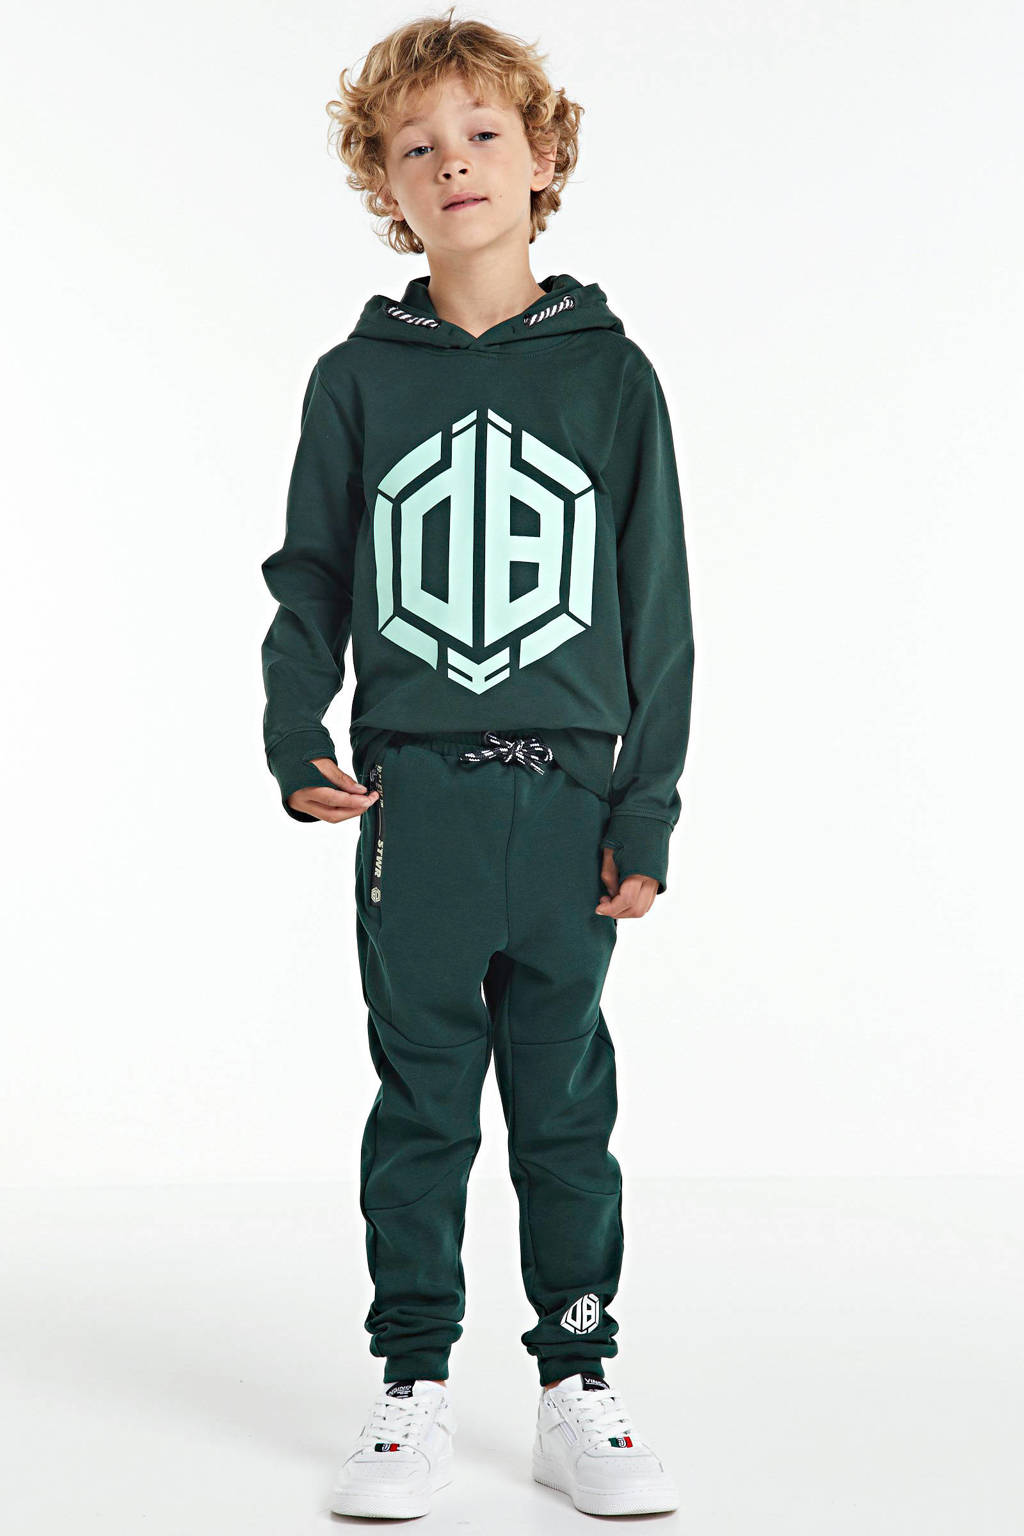 Vingino Daley Blind hoodie Nais met logo donkergroen/mintgroen, Donkergroen/mintgroen